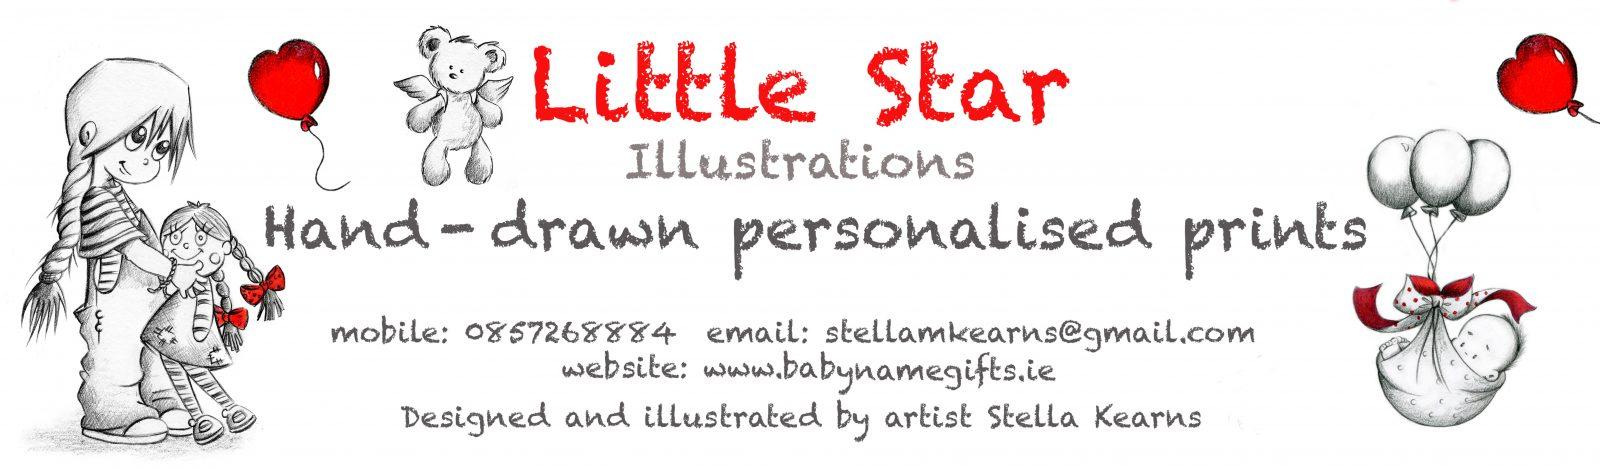 Little Star Illustrations